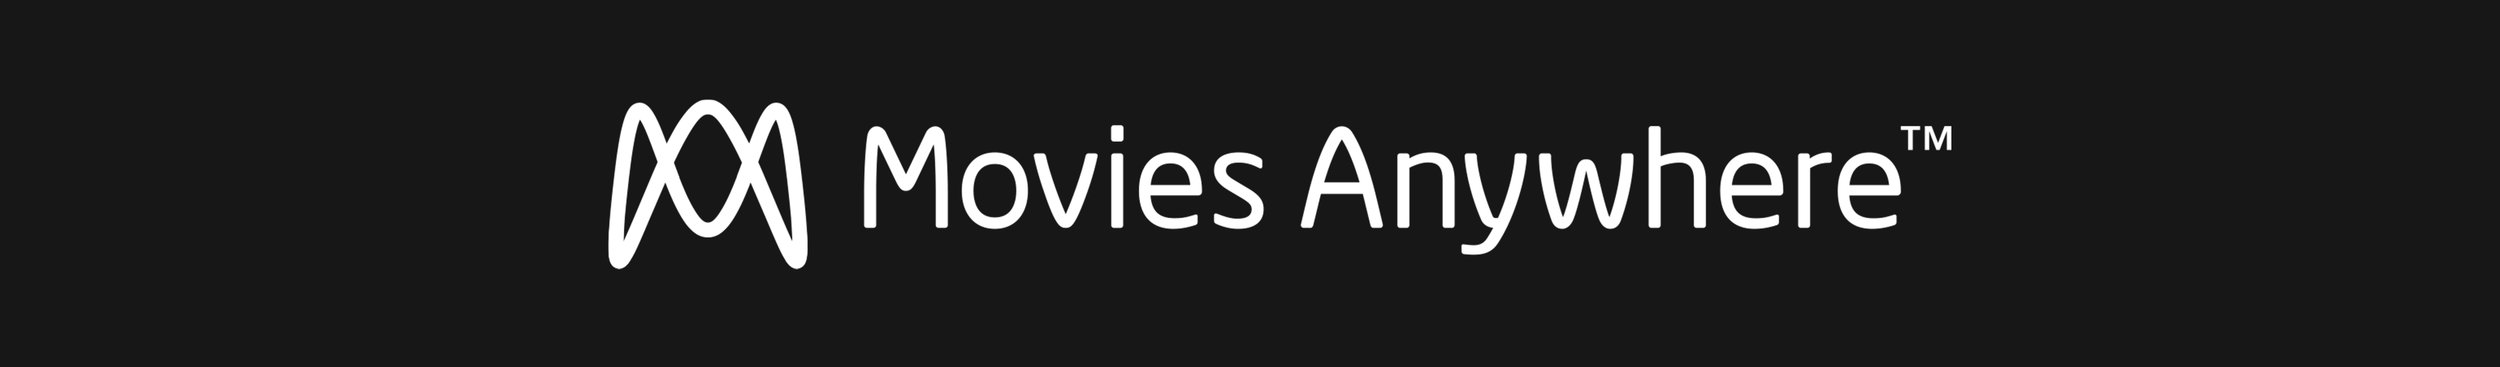 IntWebsite_Clients_White_MoviesAnywhere_02.jpg